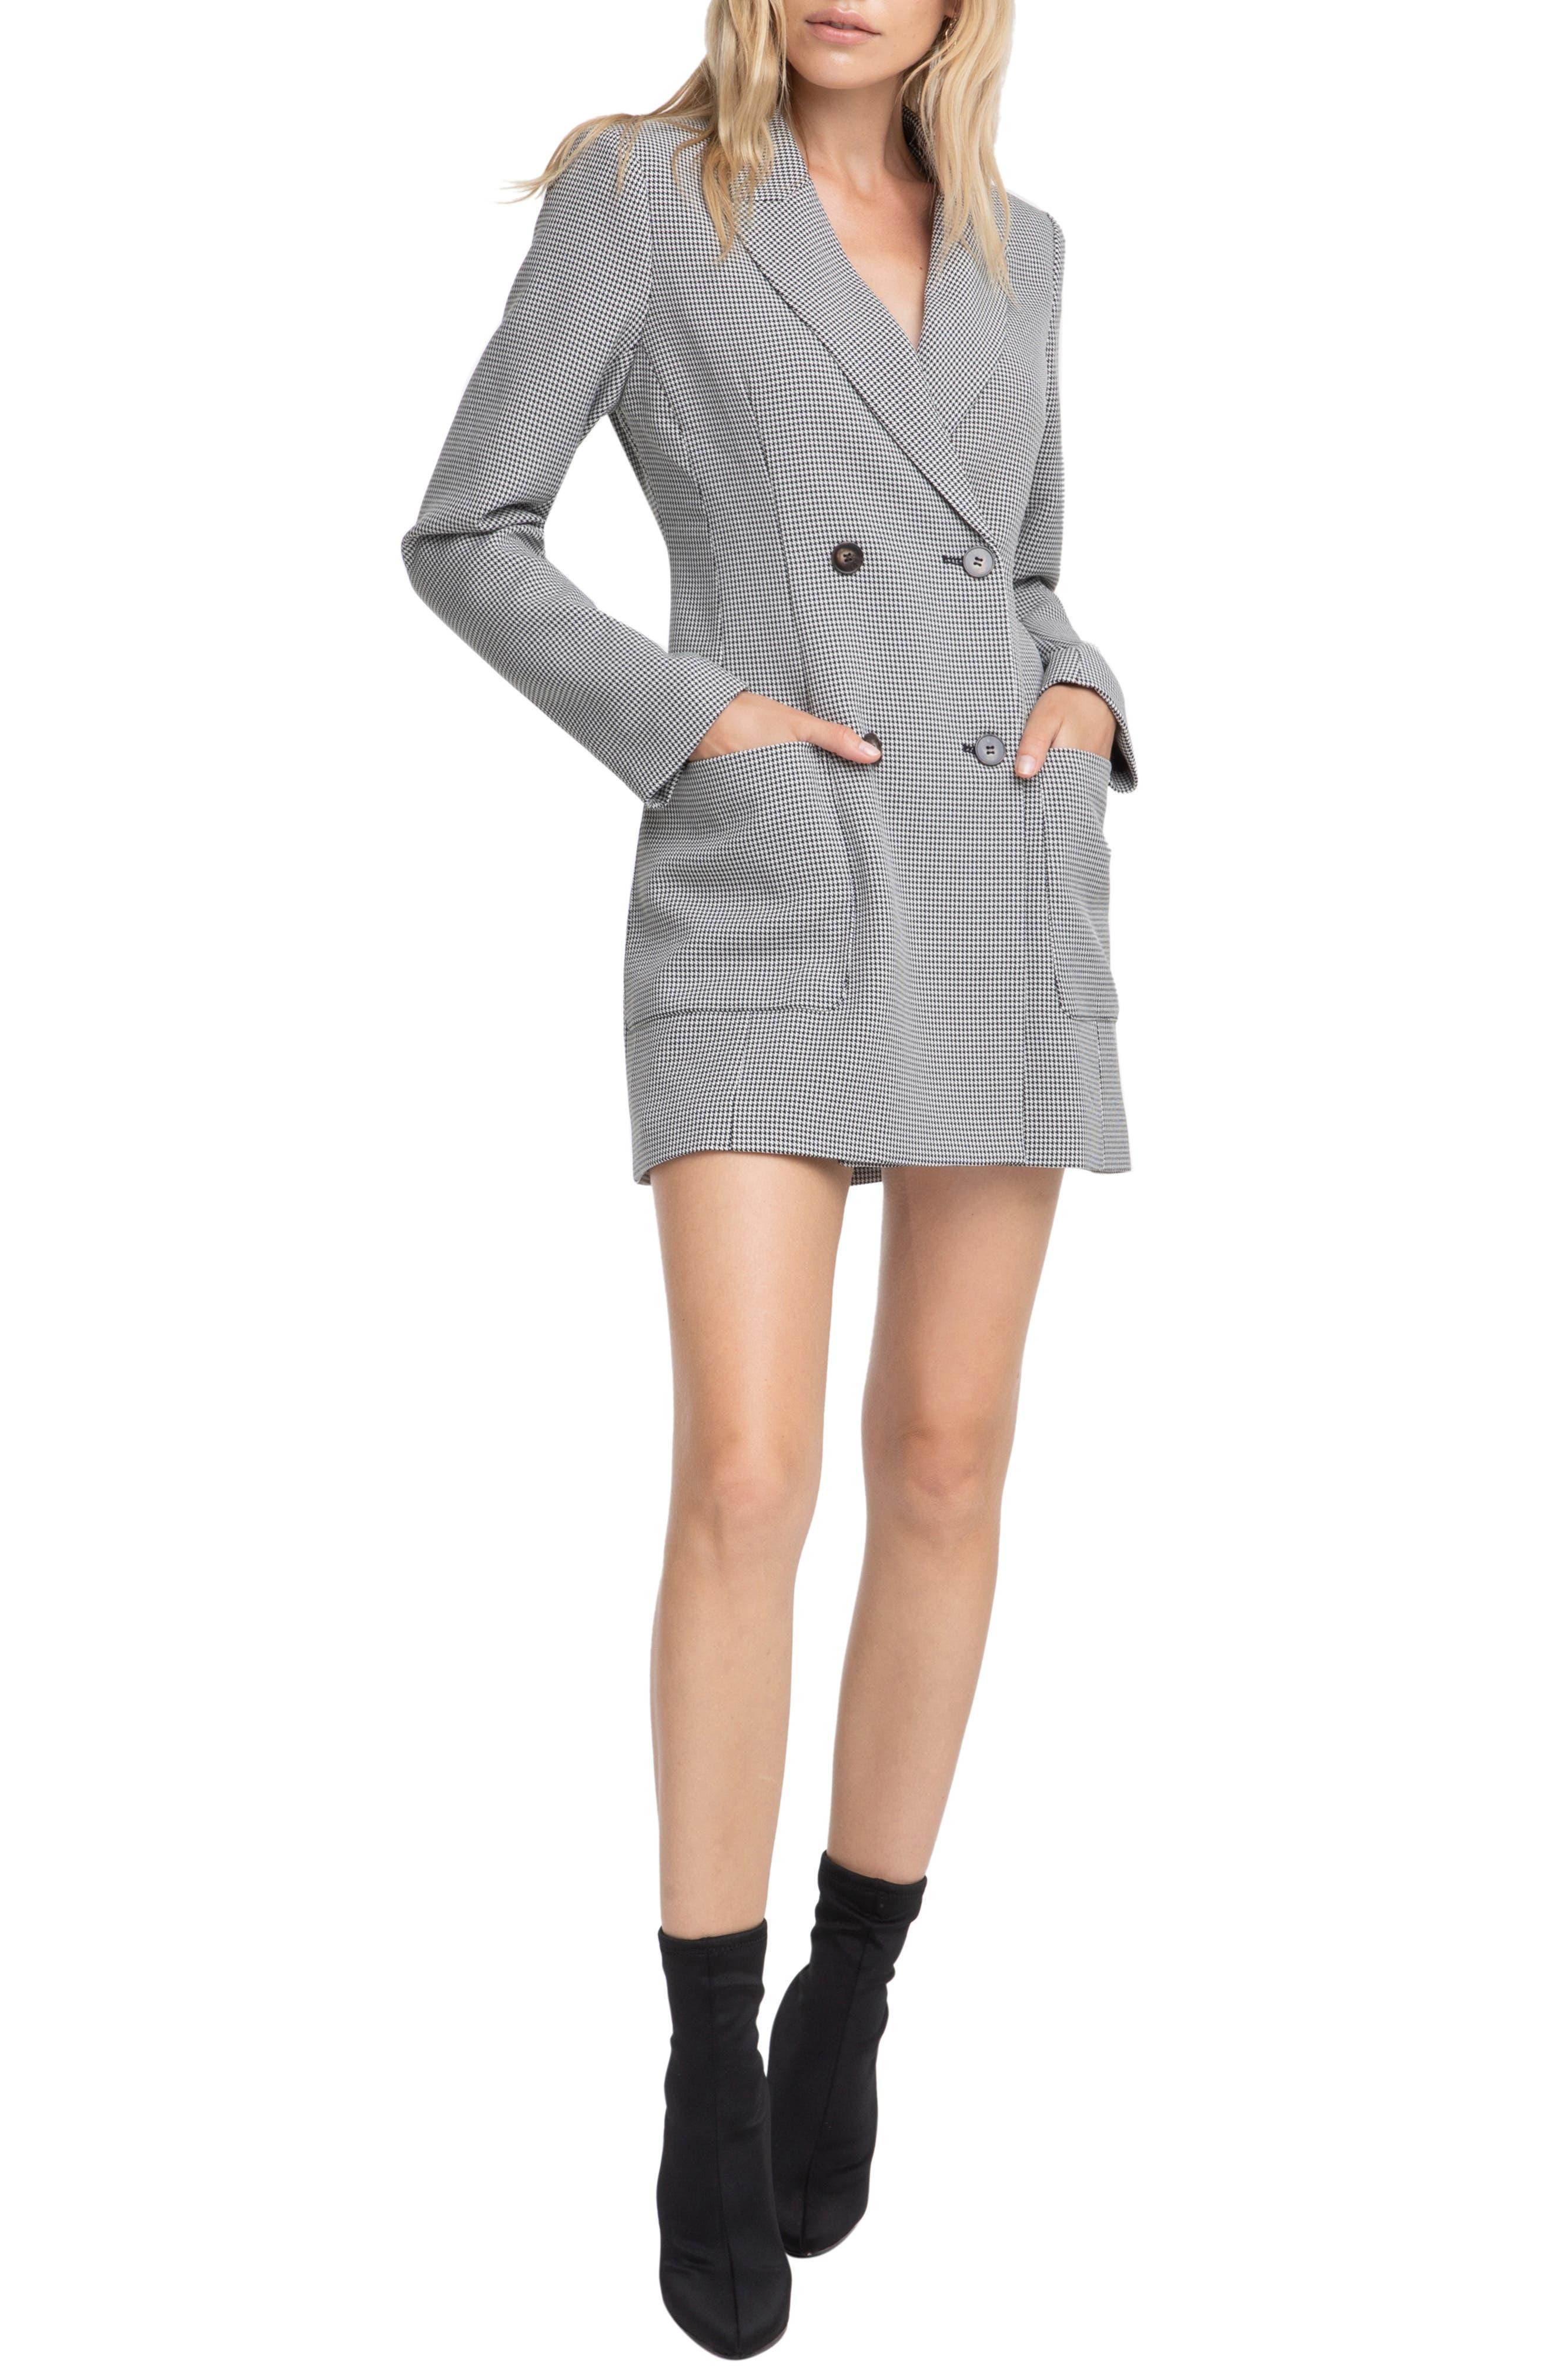 ASTR THE LABEL Houndstooth Blazer Dress, Main, color, BLACK/ WHITE